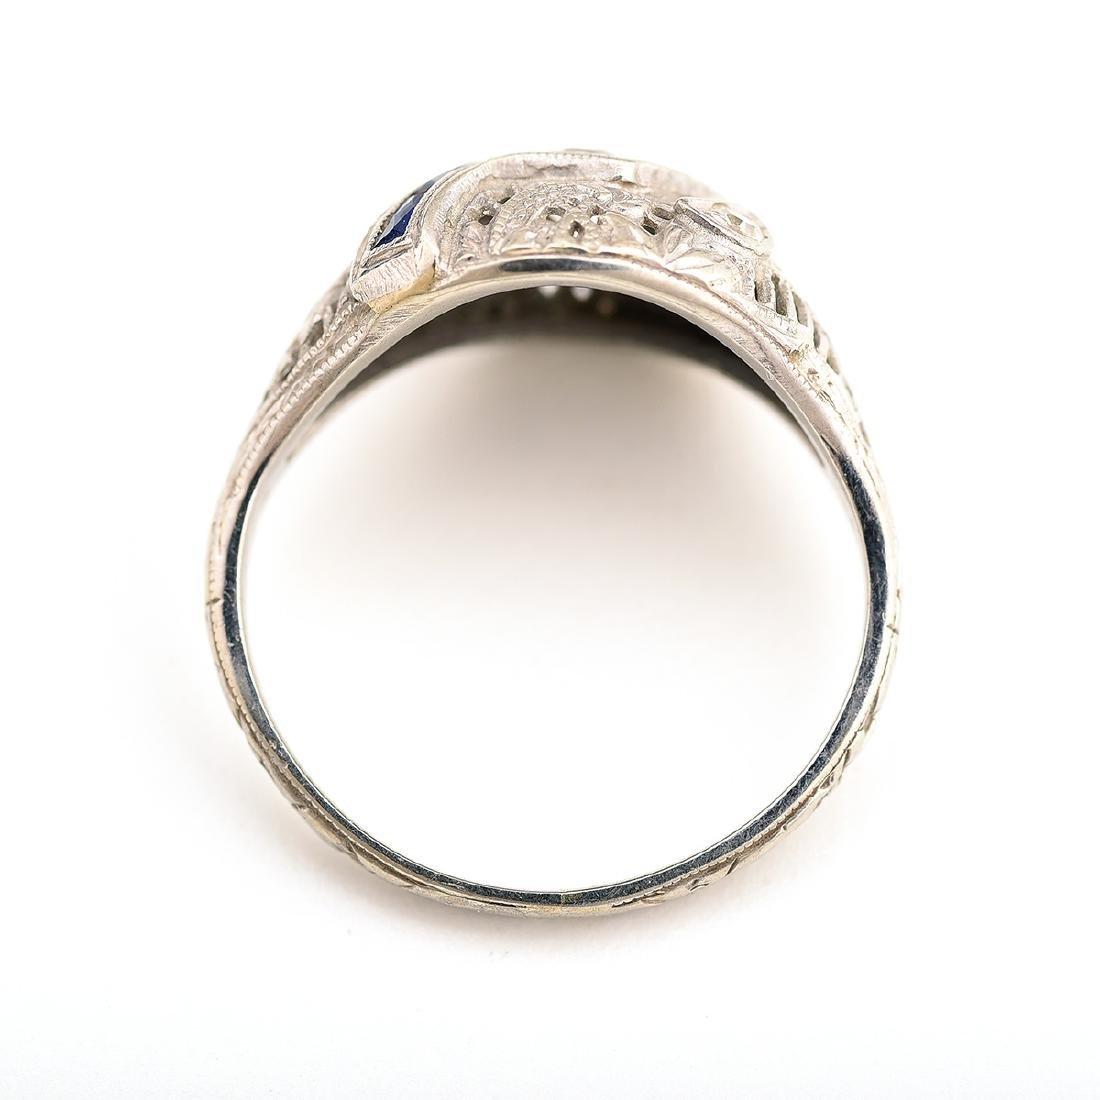 Vintage Diamond, Sapphire, 18k White Gold Ring. - 3